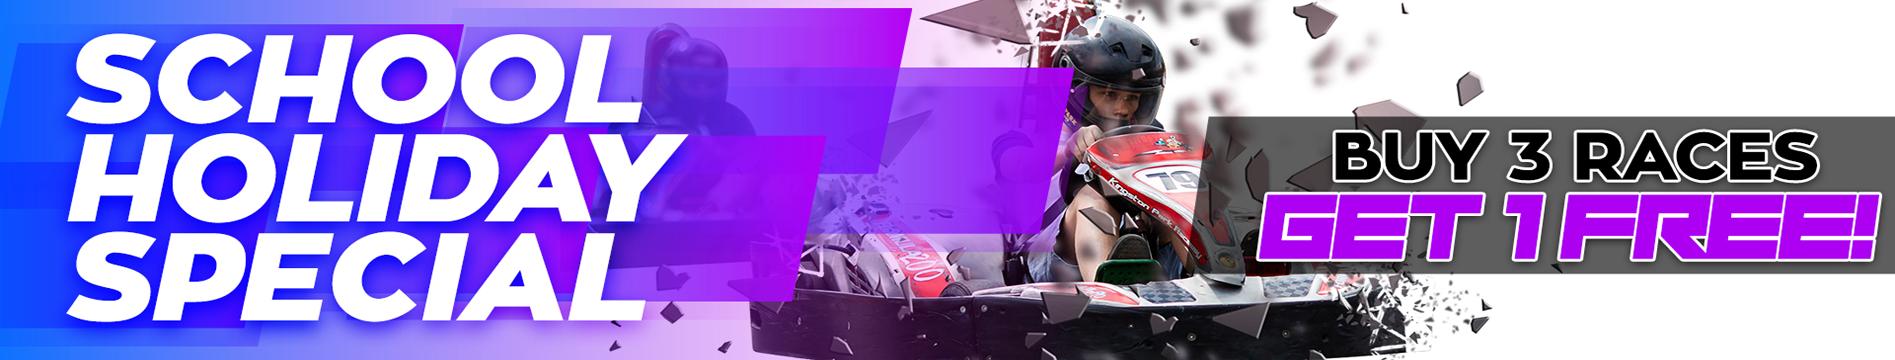 Kingston-Park-Raceway-Go-Karting-School-Holiday-Offer